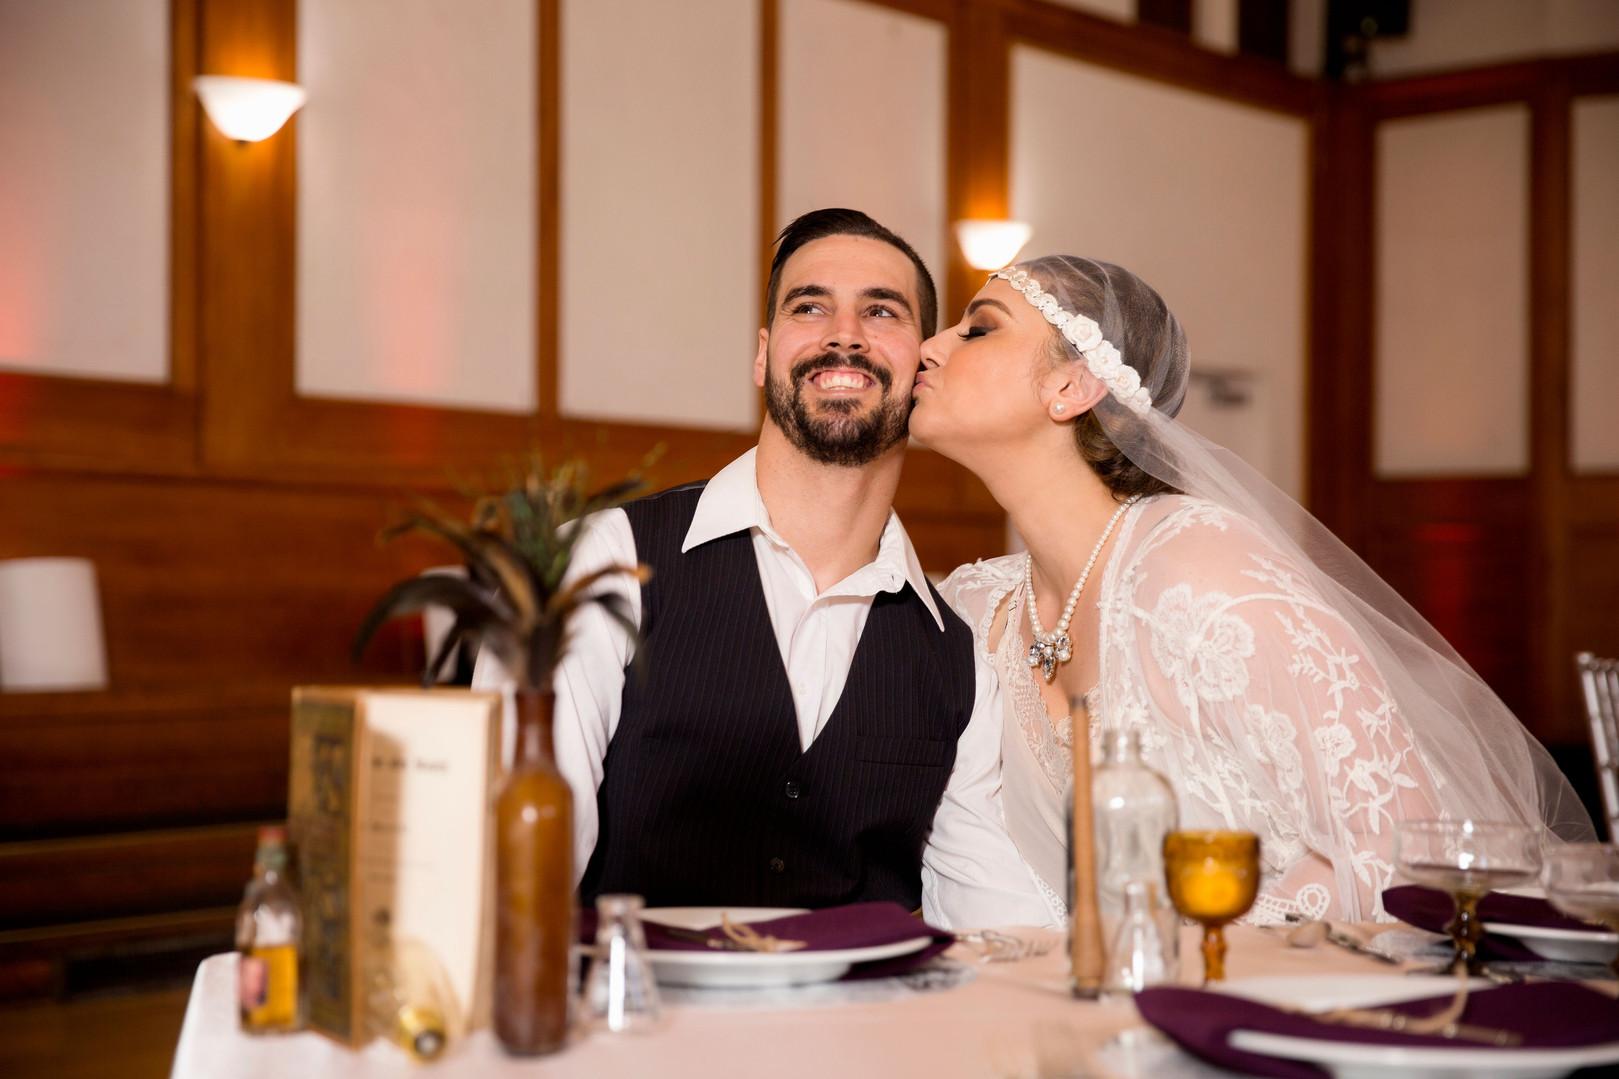 Grand Opening Photoshoot - Bride and Groom in Fullerton Room (Main Ballroom)